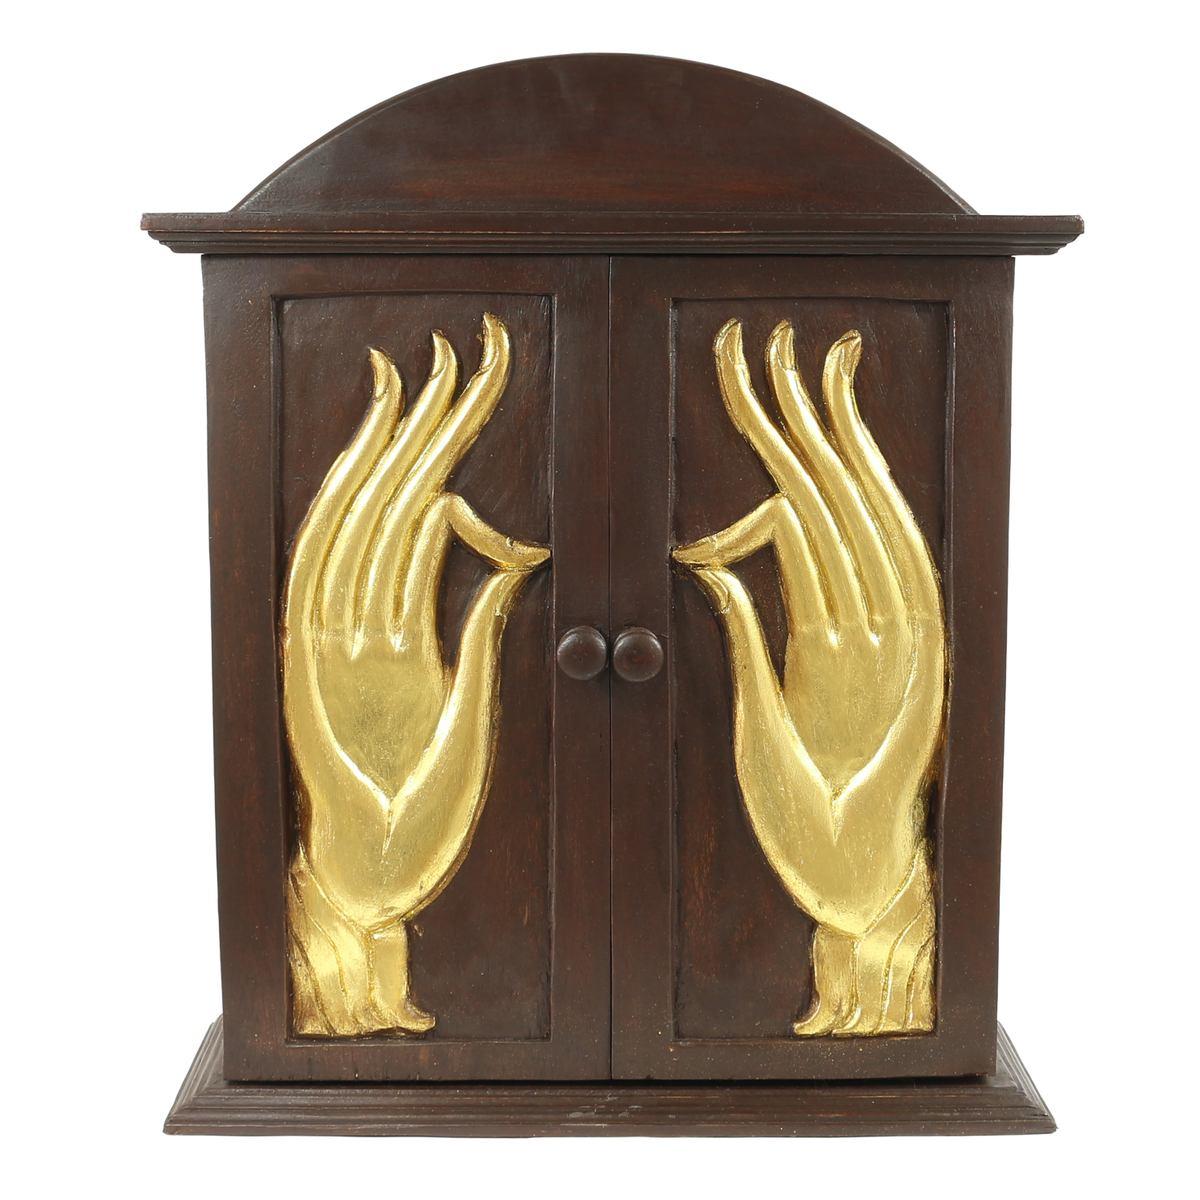 h nde schrank h ngeschrank medizinschrank blattgold akazienholz flurschrank 65cm braun gold. Black Bedroom Furniture Sets. Home Design Ideas